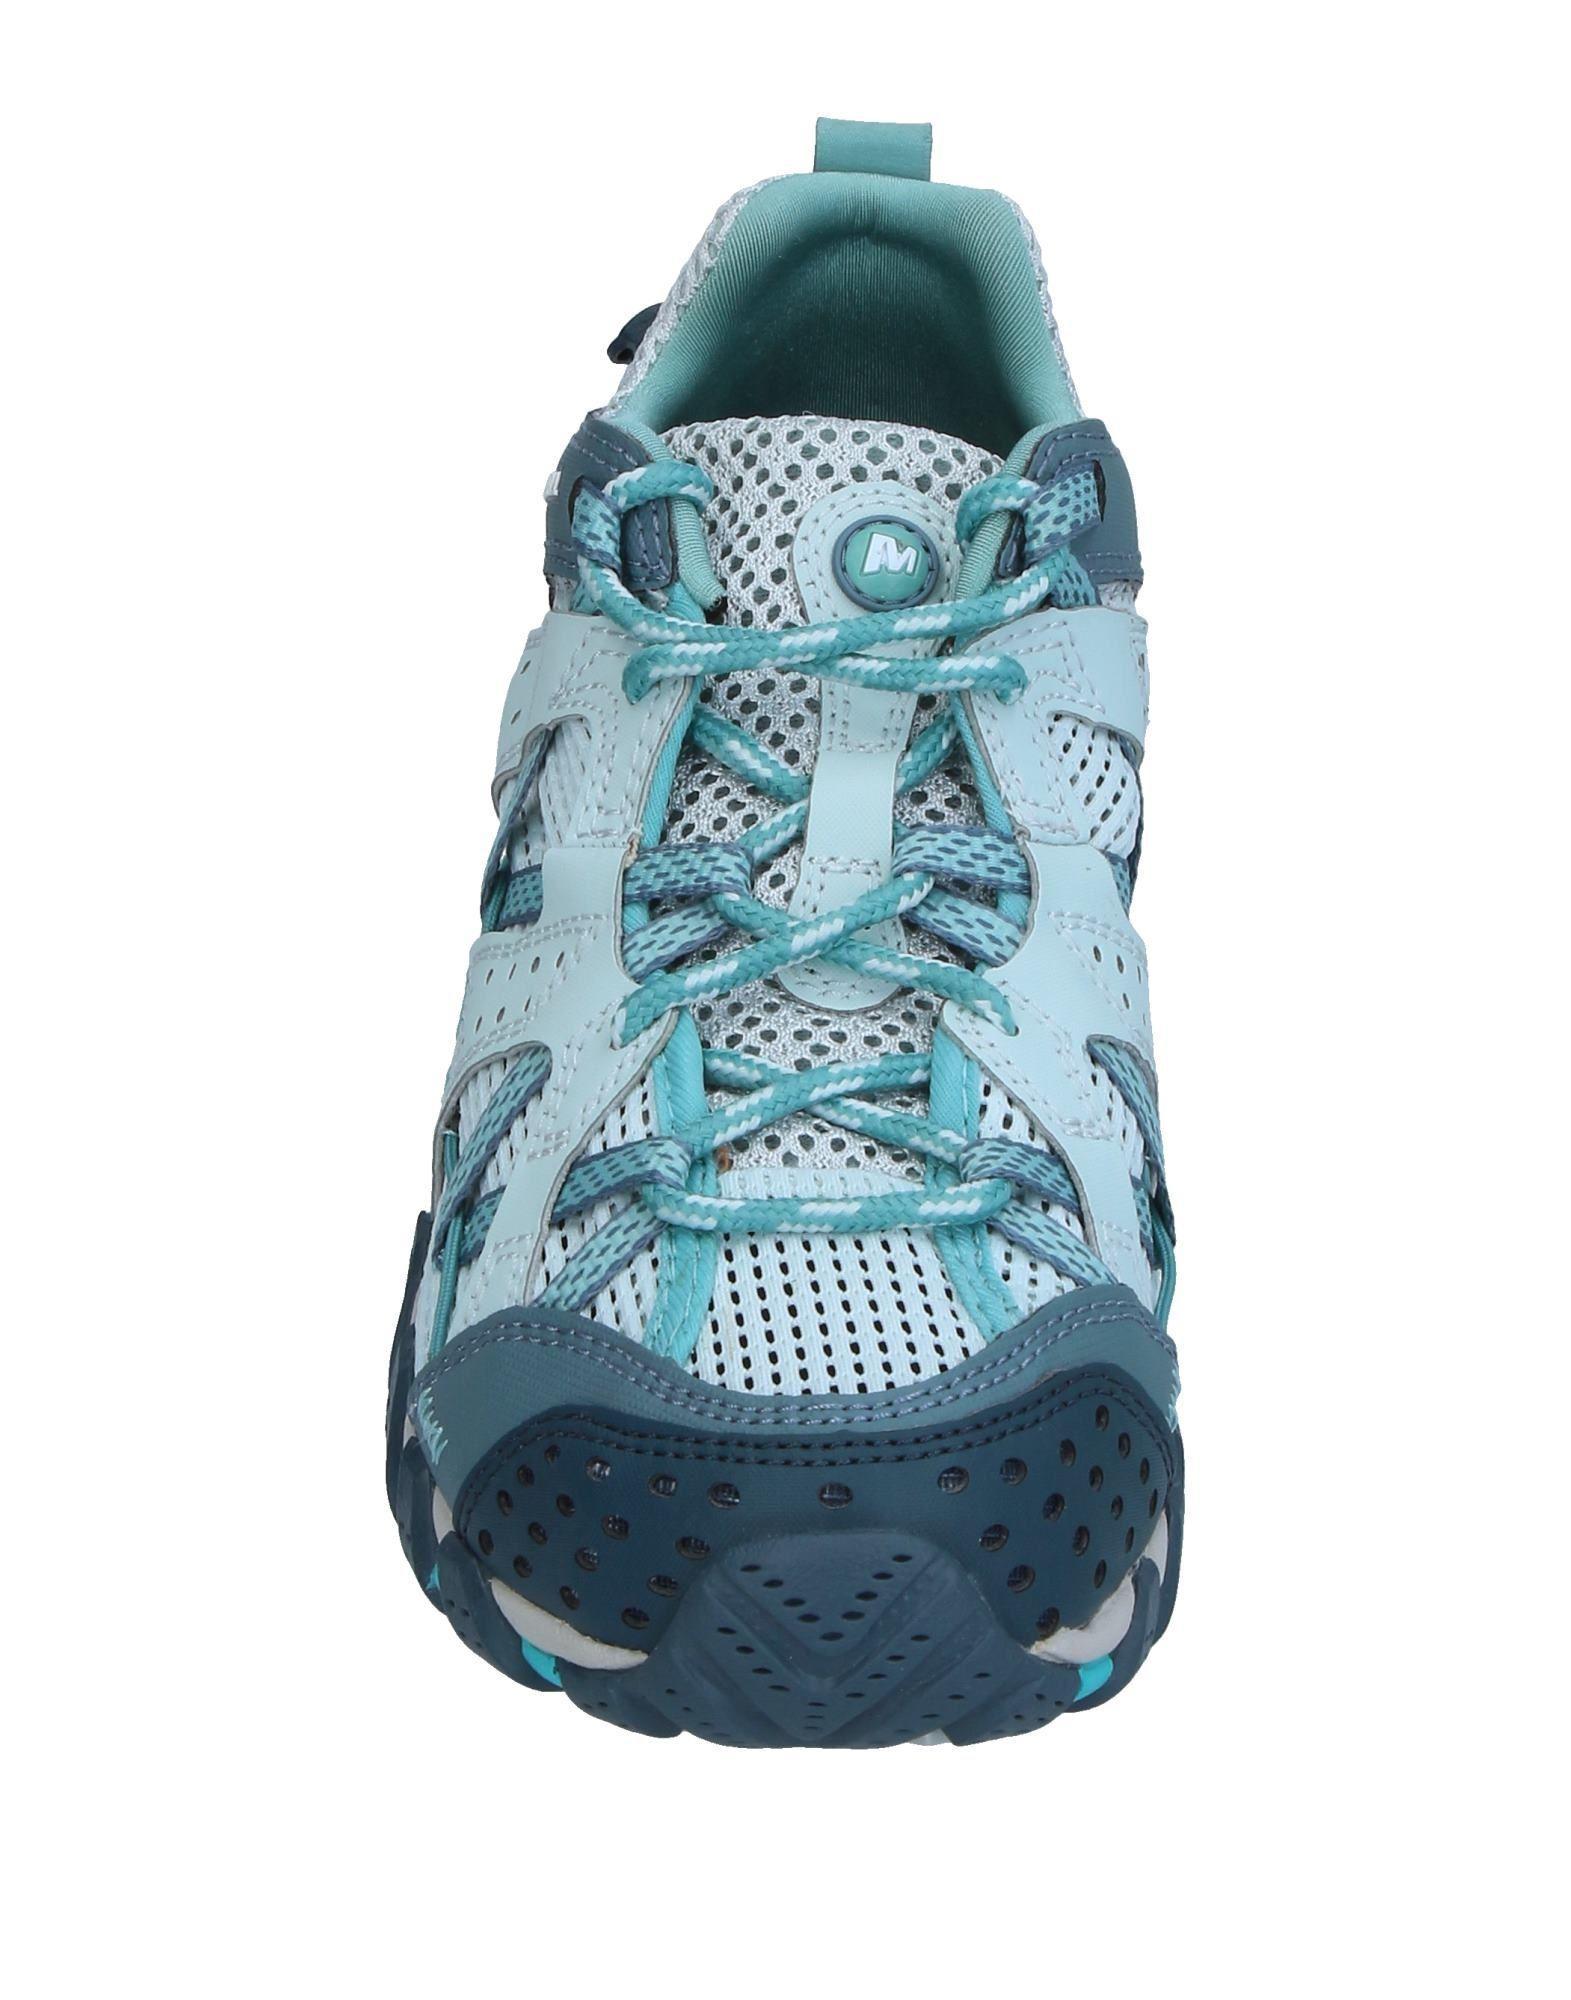 Merrell Rubber Low-tops & Sneakers in Sky Blue (Blue)